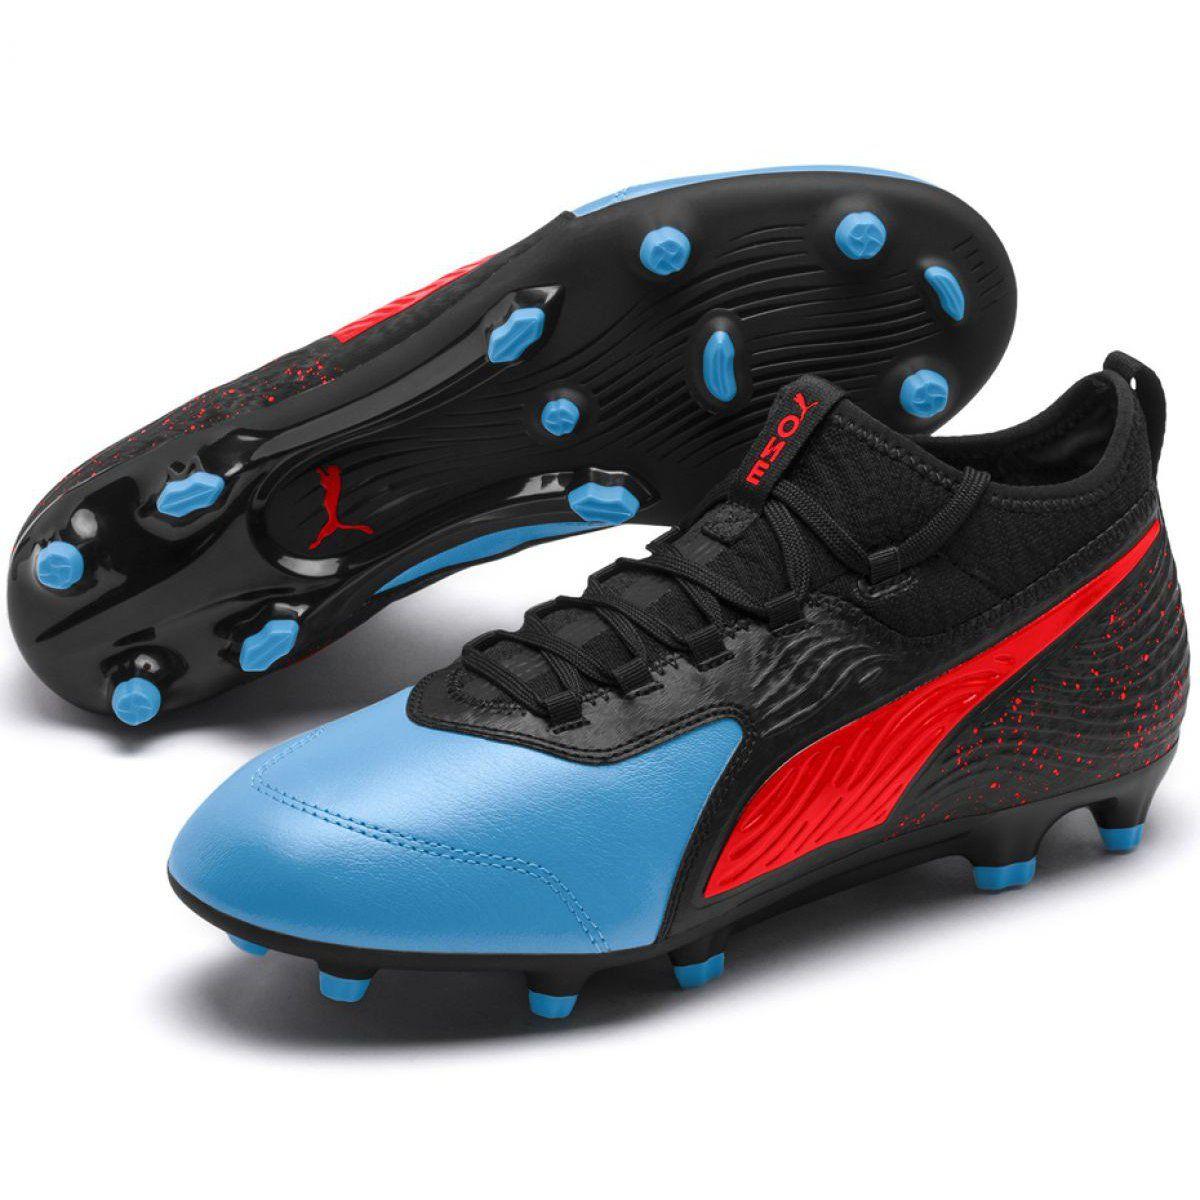 Buty Pilkarskie Puma One 19 3 Fg Ag M 105486 01 Czarne Czarne Football Boots Soccer Cleats Football Shoes